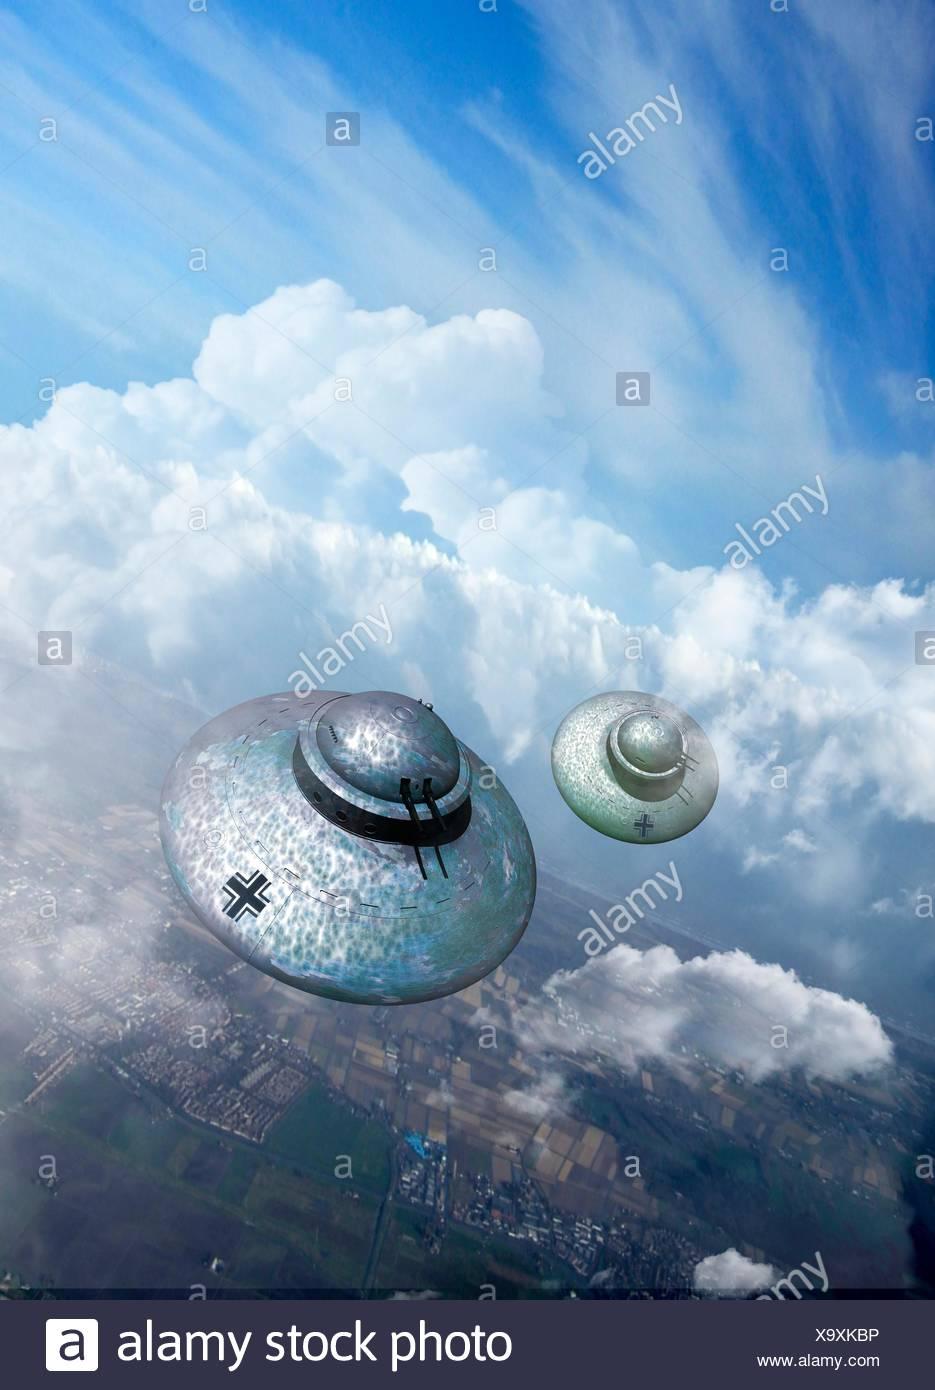 UFOs, computer illustration. - Stock Image